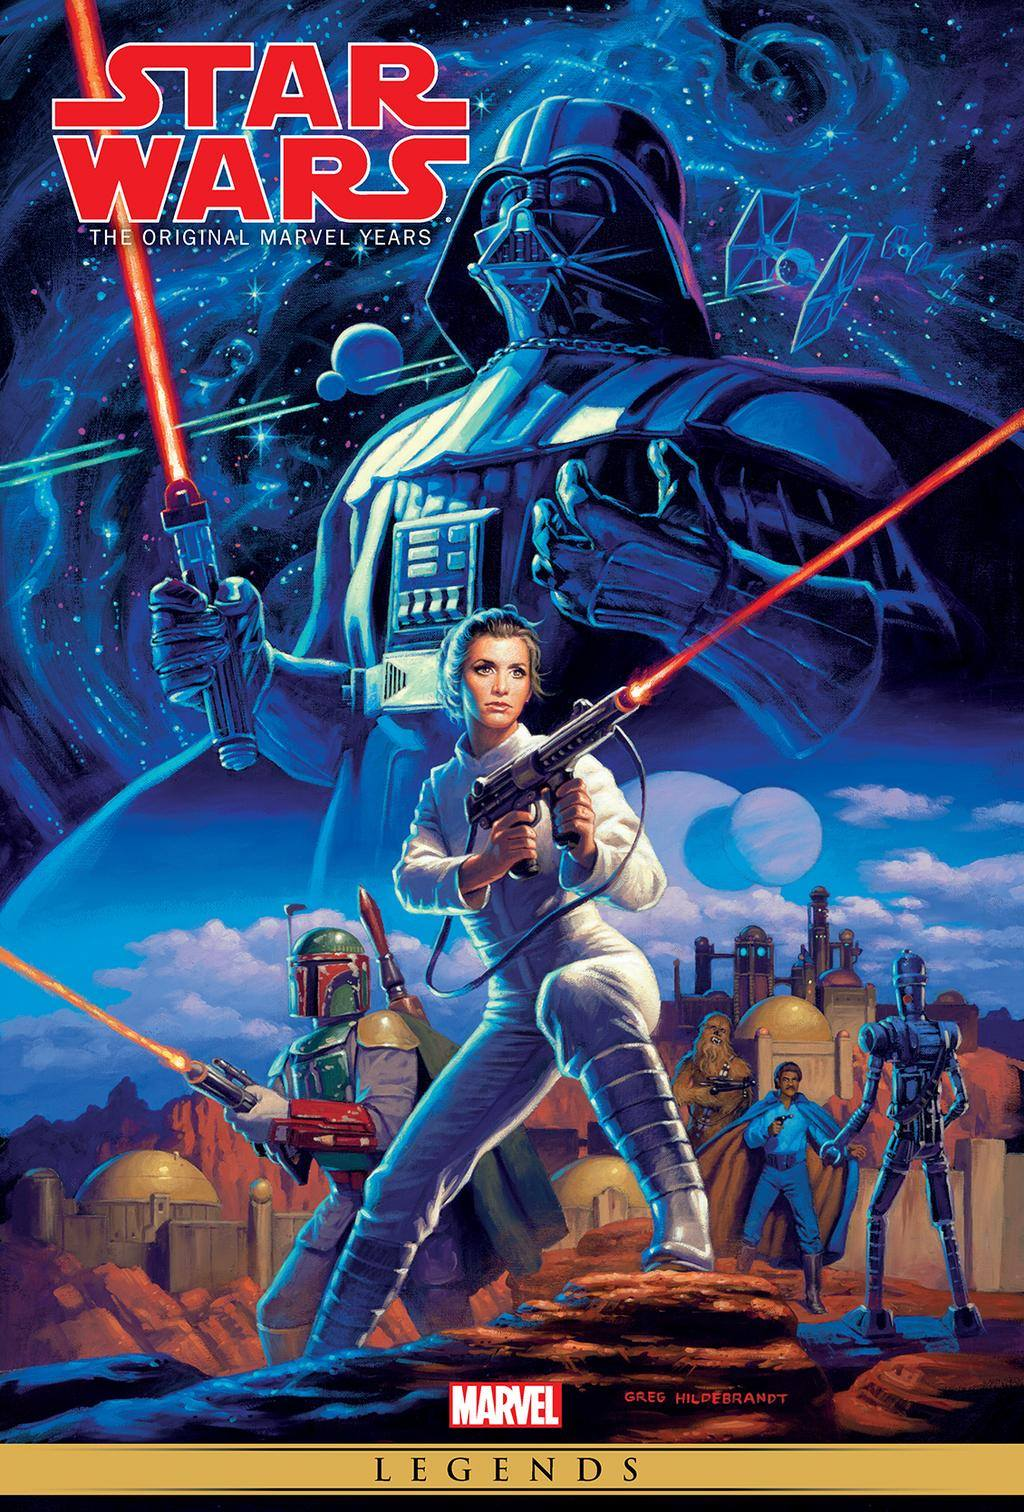 Star Wars: The Original Marvel Years Omnibus Volume 2 (2015)